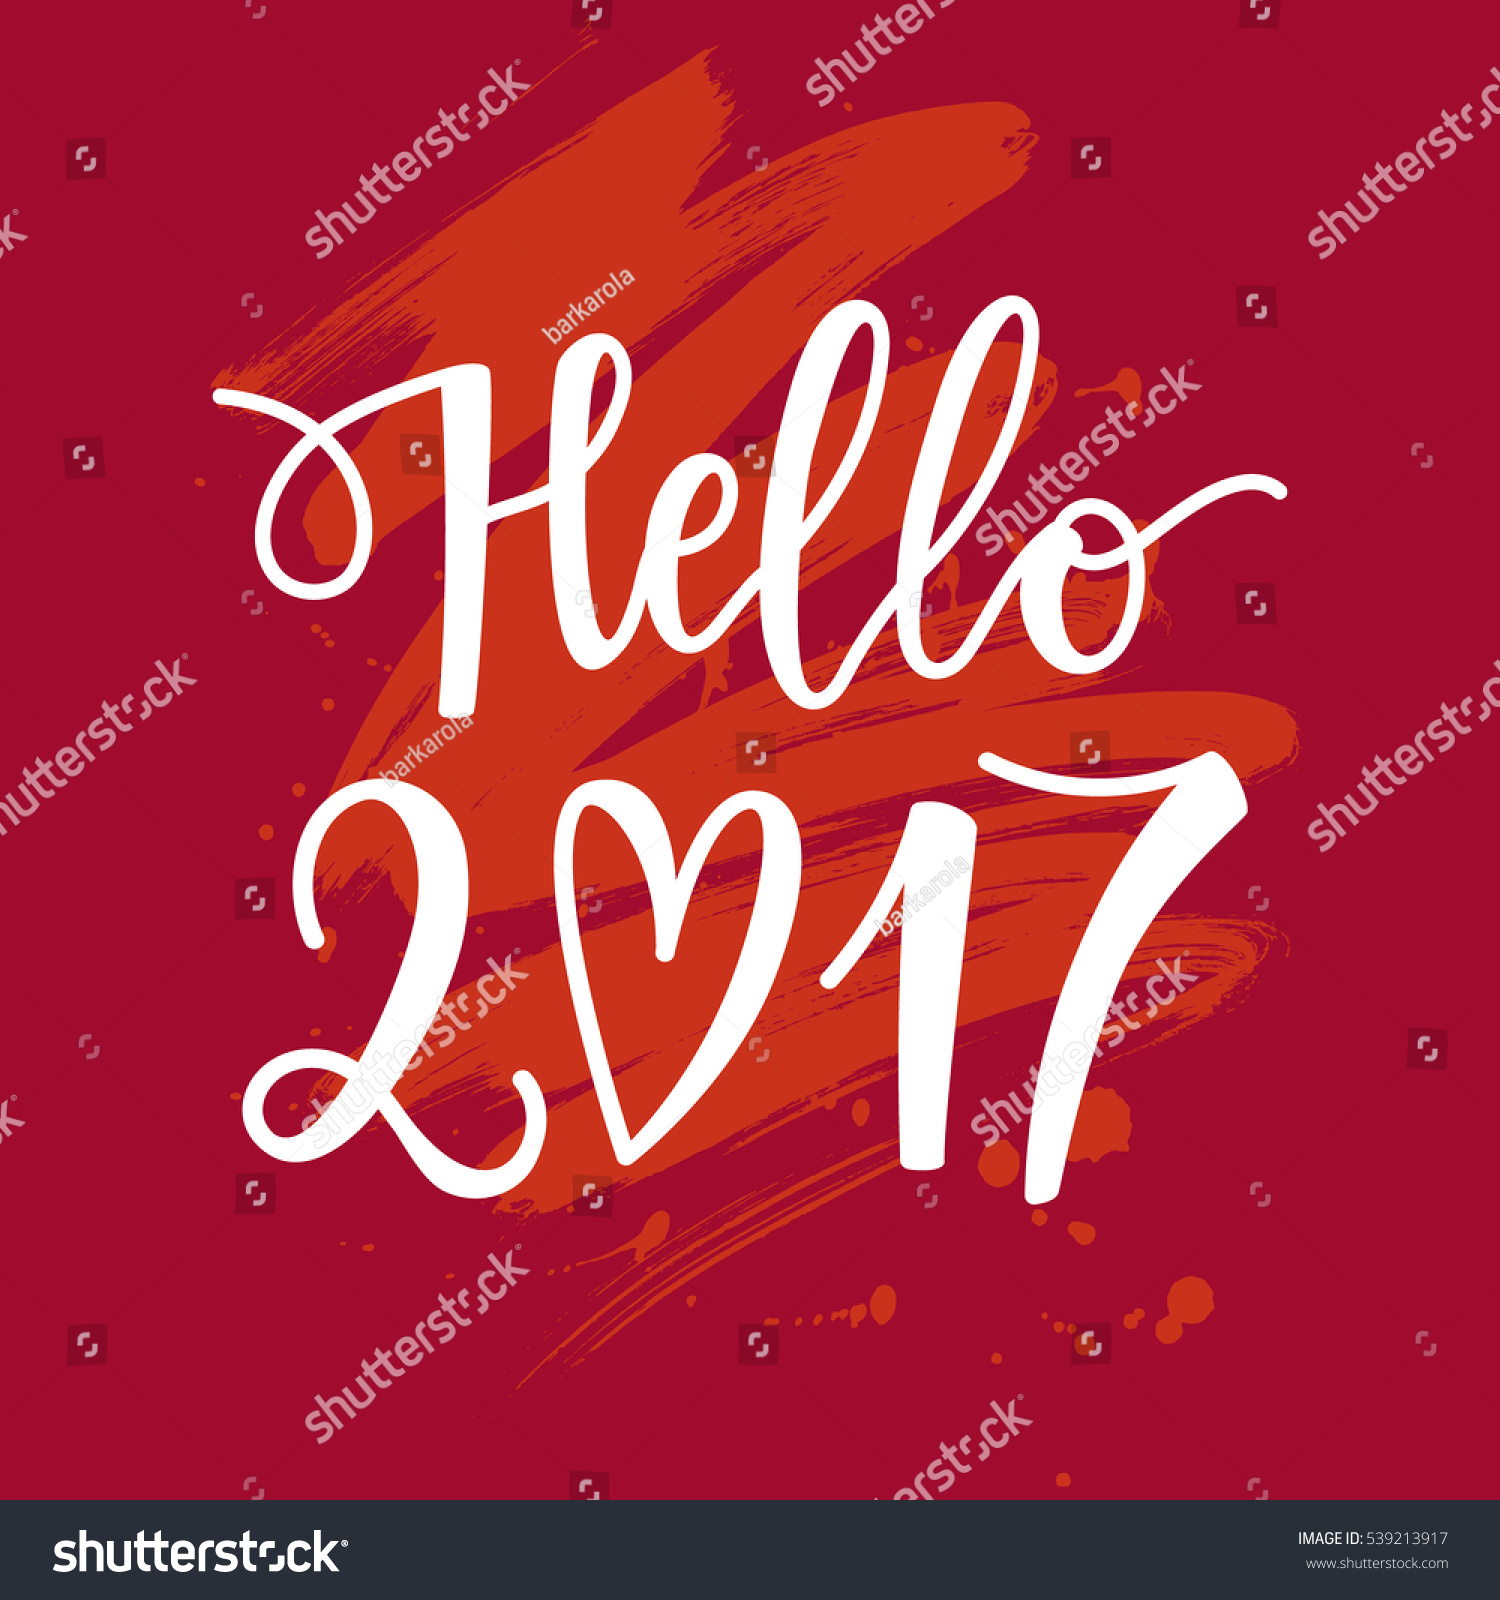 vector hand drawn hello phrase stock vector  vector hand drawn hello 2017 phrase on a paint background new year card holiday